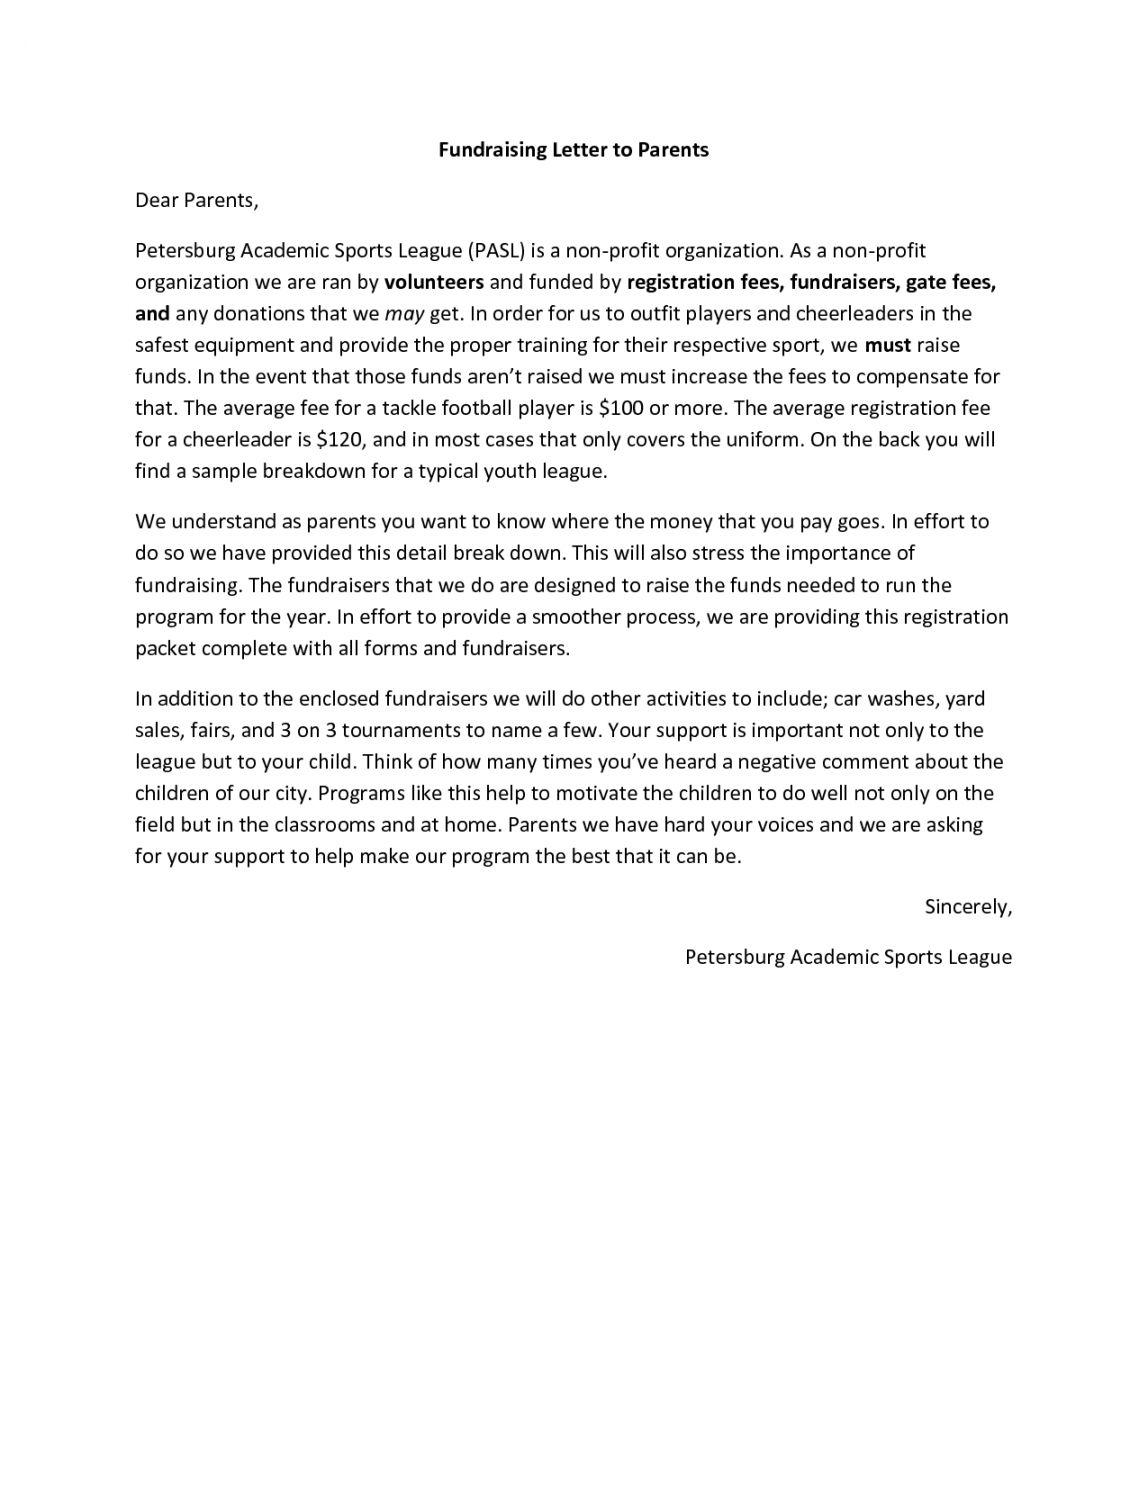 Sample 10 Fundraising Letters Ideas Fundraising Letter Team In Training Sample Fundraising L Fundraising Letter Sample Fundraising Letters Letter To Parents